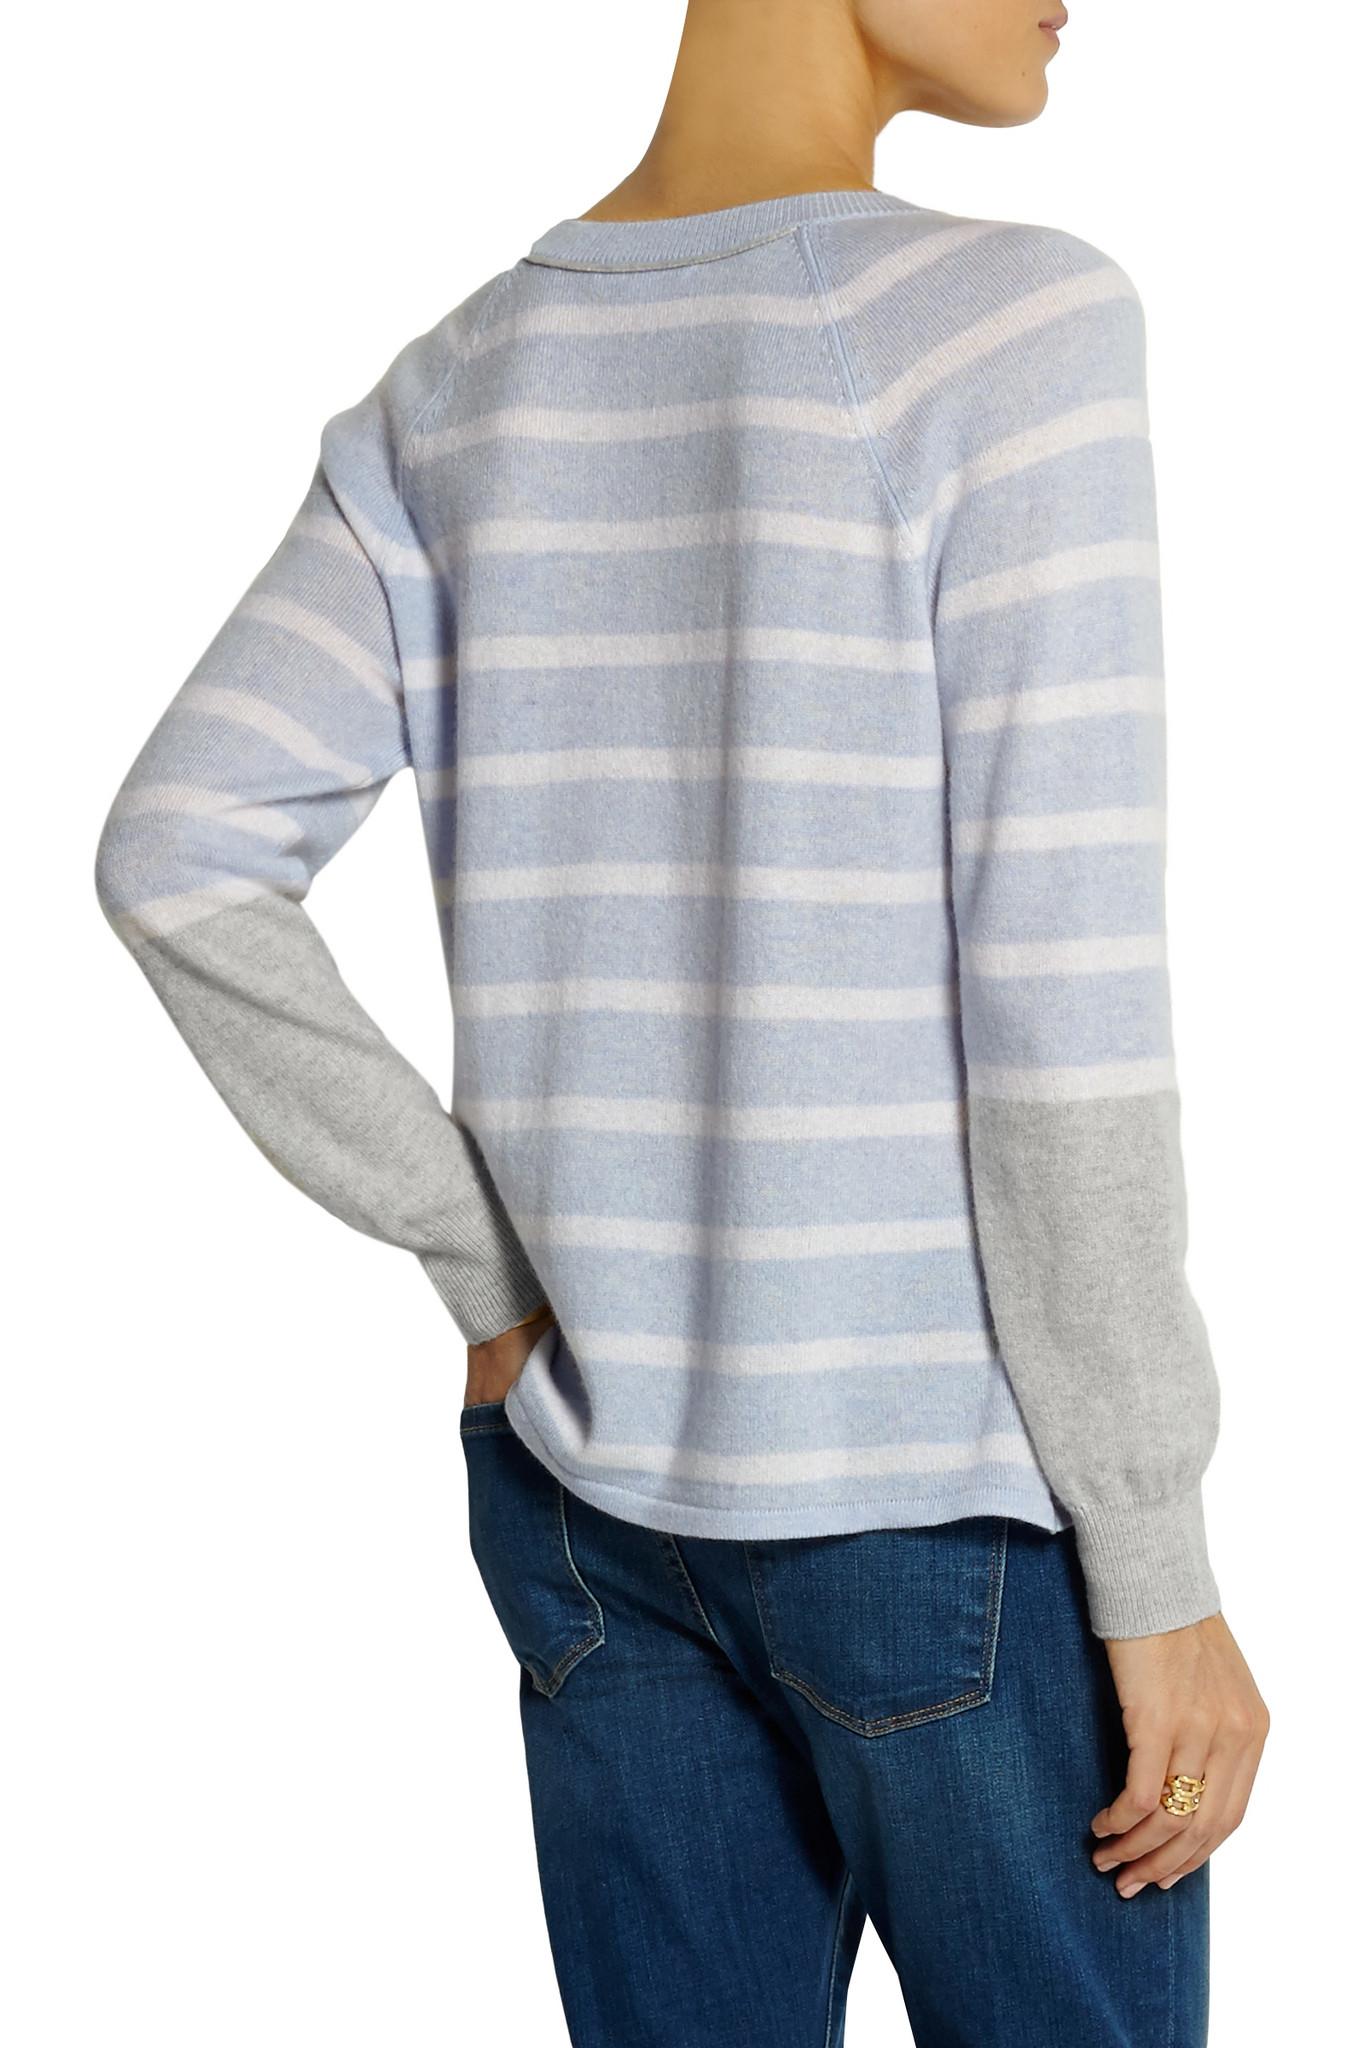 Duffy Striped Cashmere Sweater in Blue | Lyst